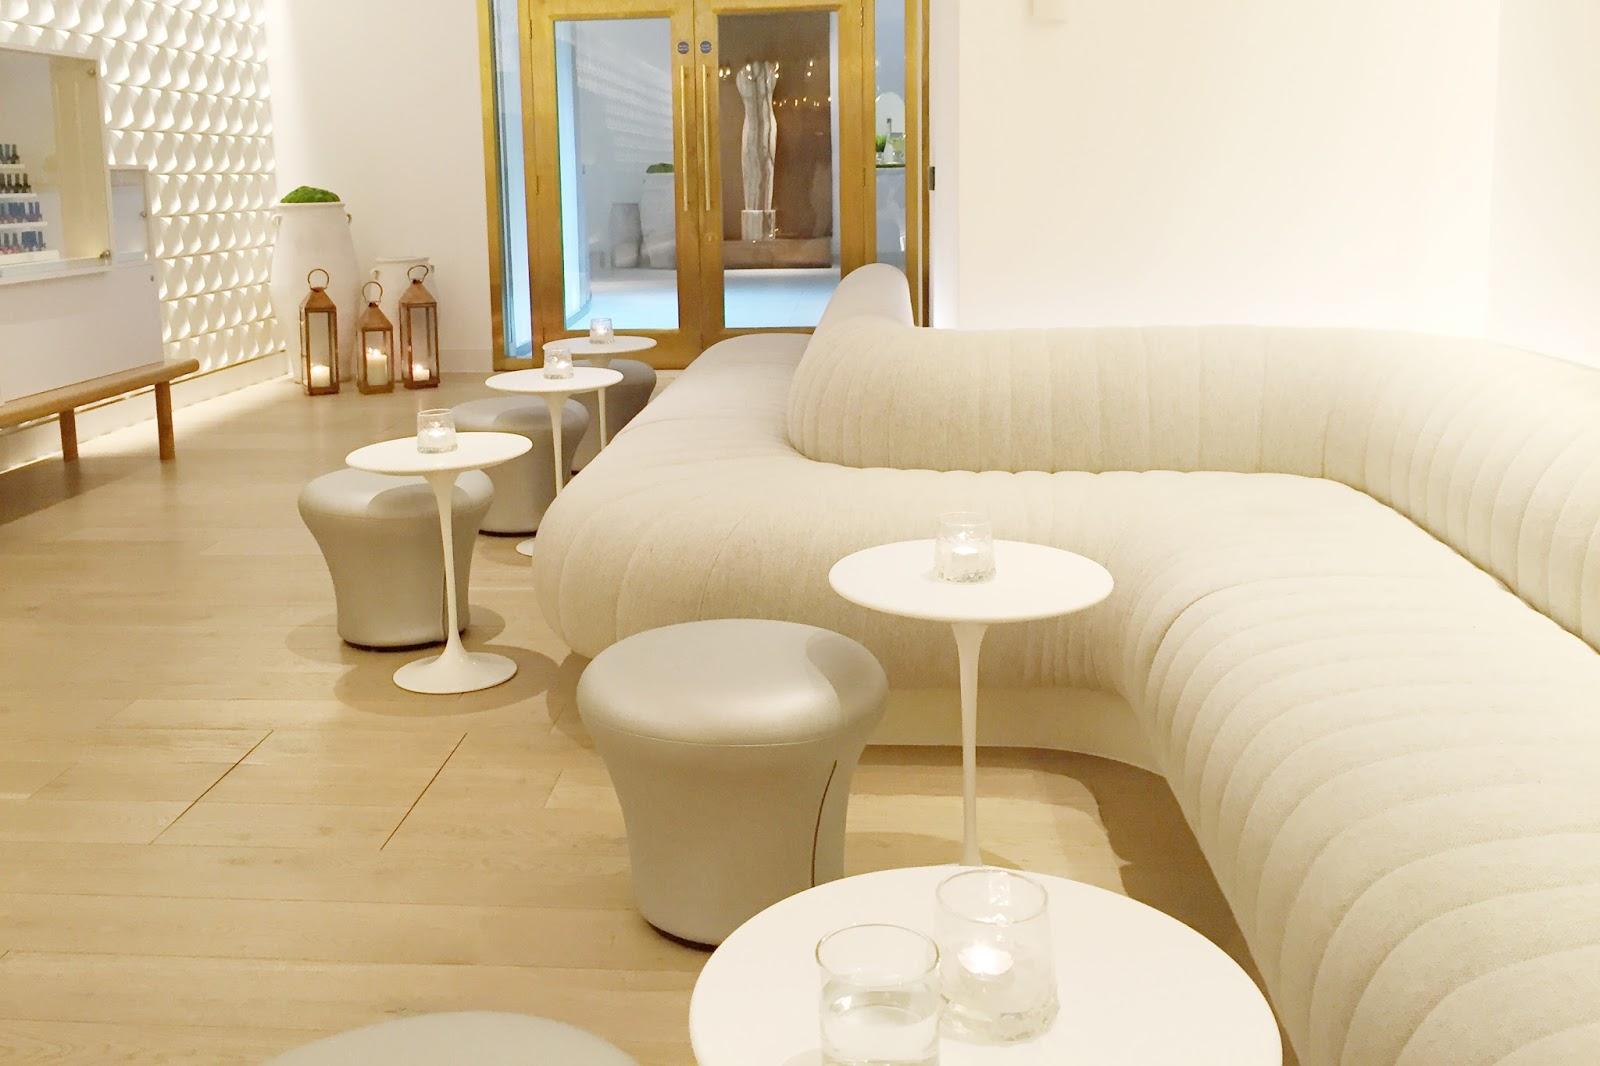 Mondrian Agua Bathhouse & Spa Review